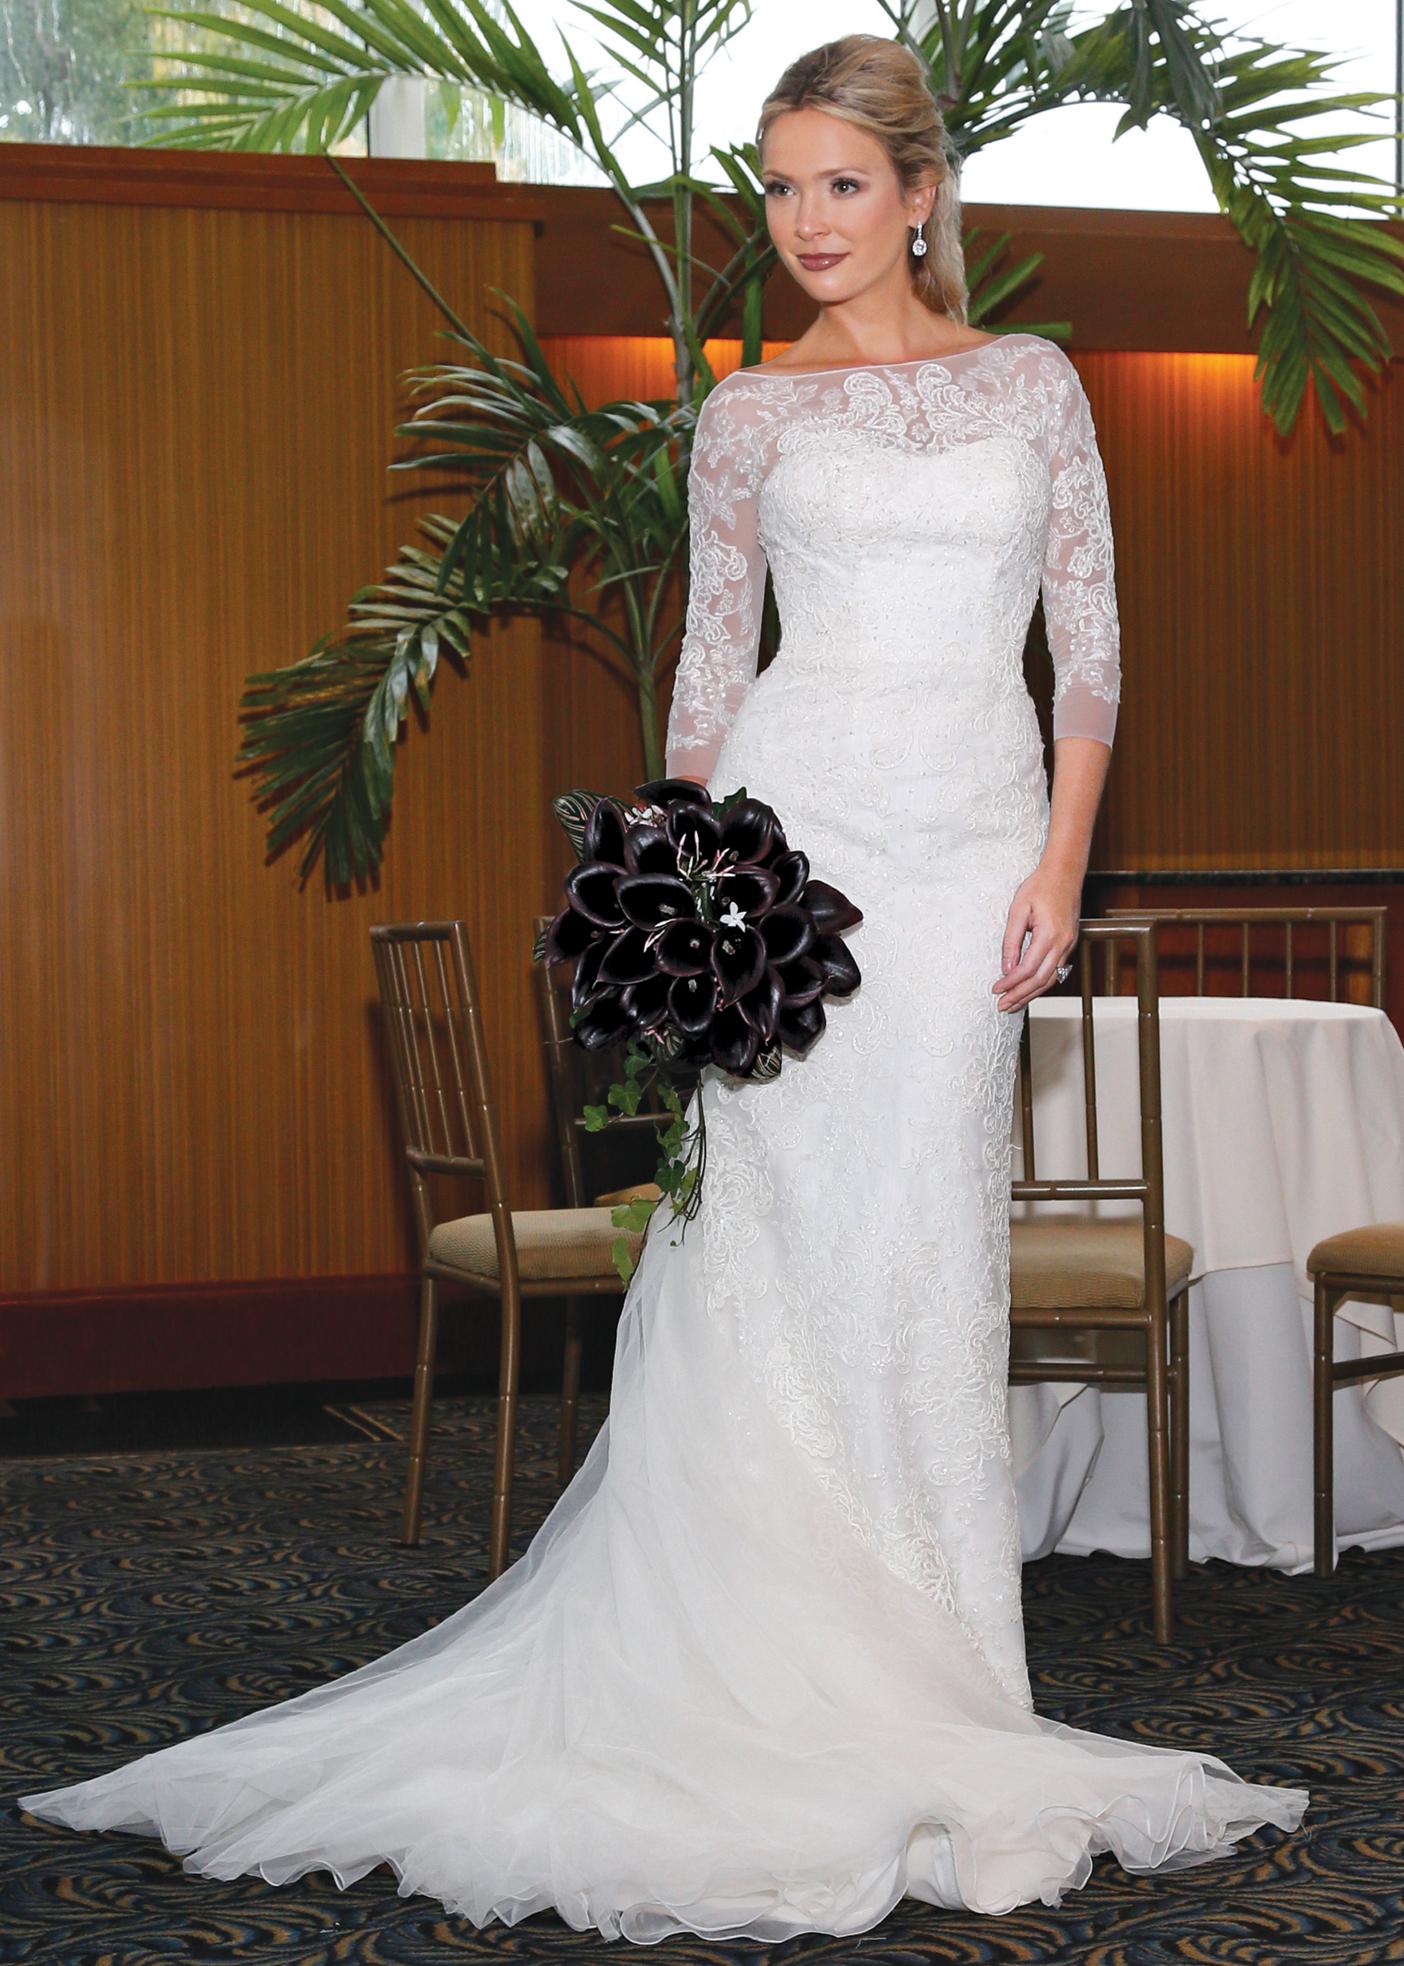 Bridesmaid Dress Oleg Cassini Mermaid Wedding Dress Bow